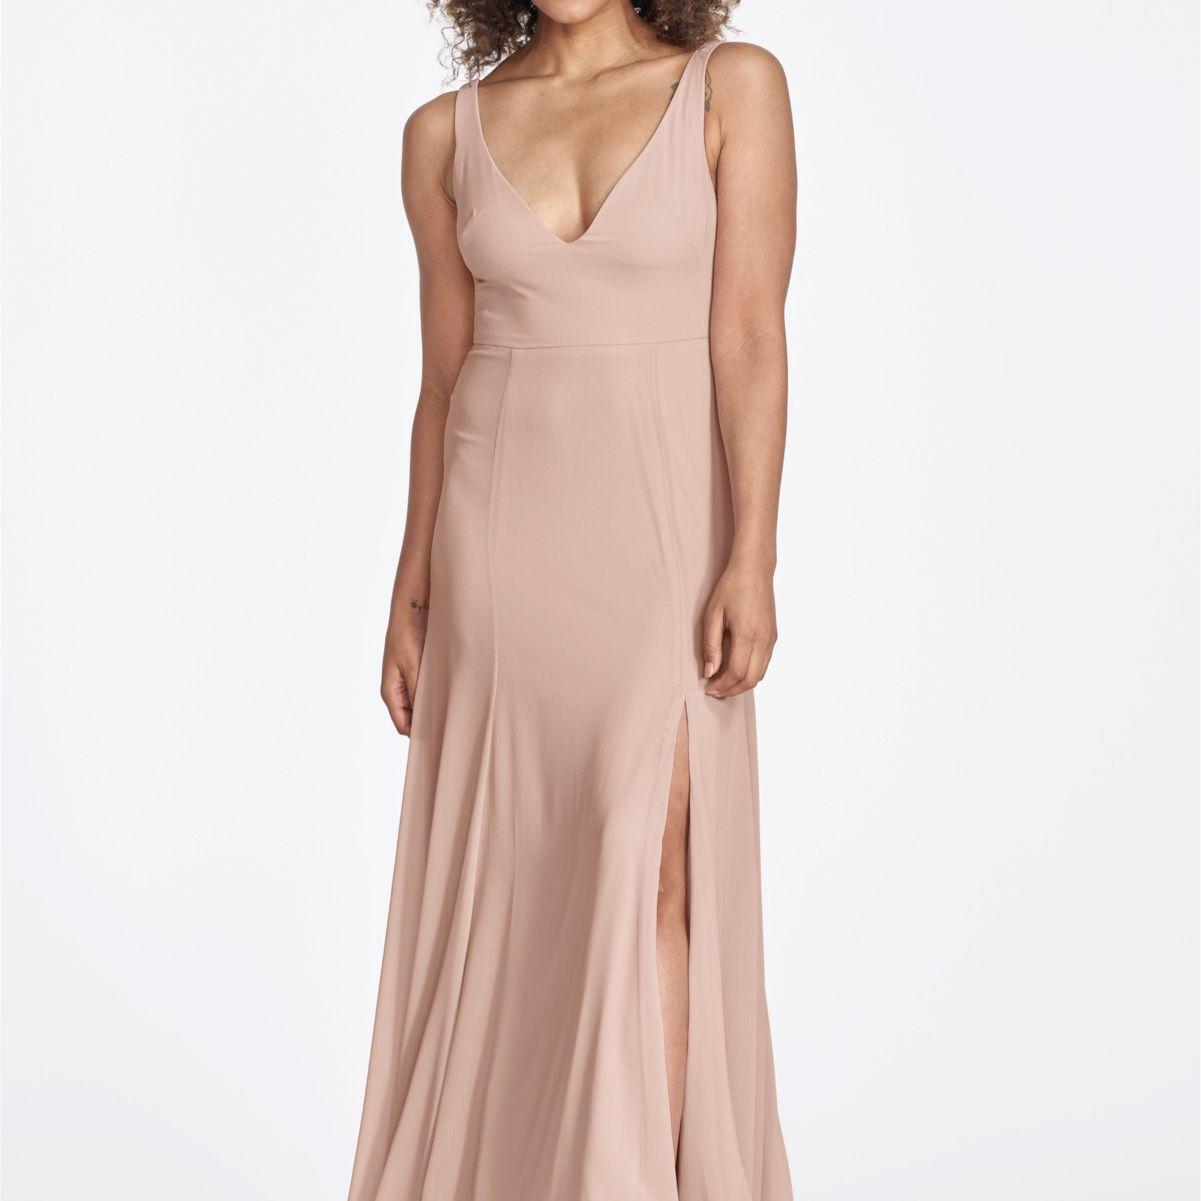 Watters Shanice Bridesmaid Dress